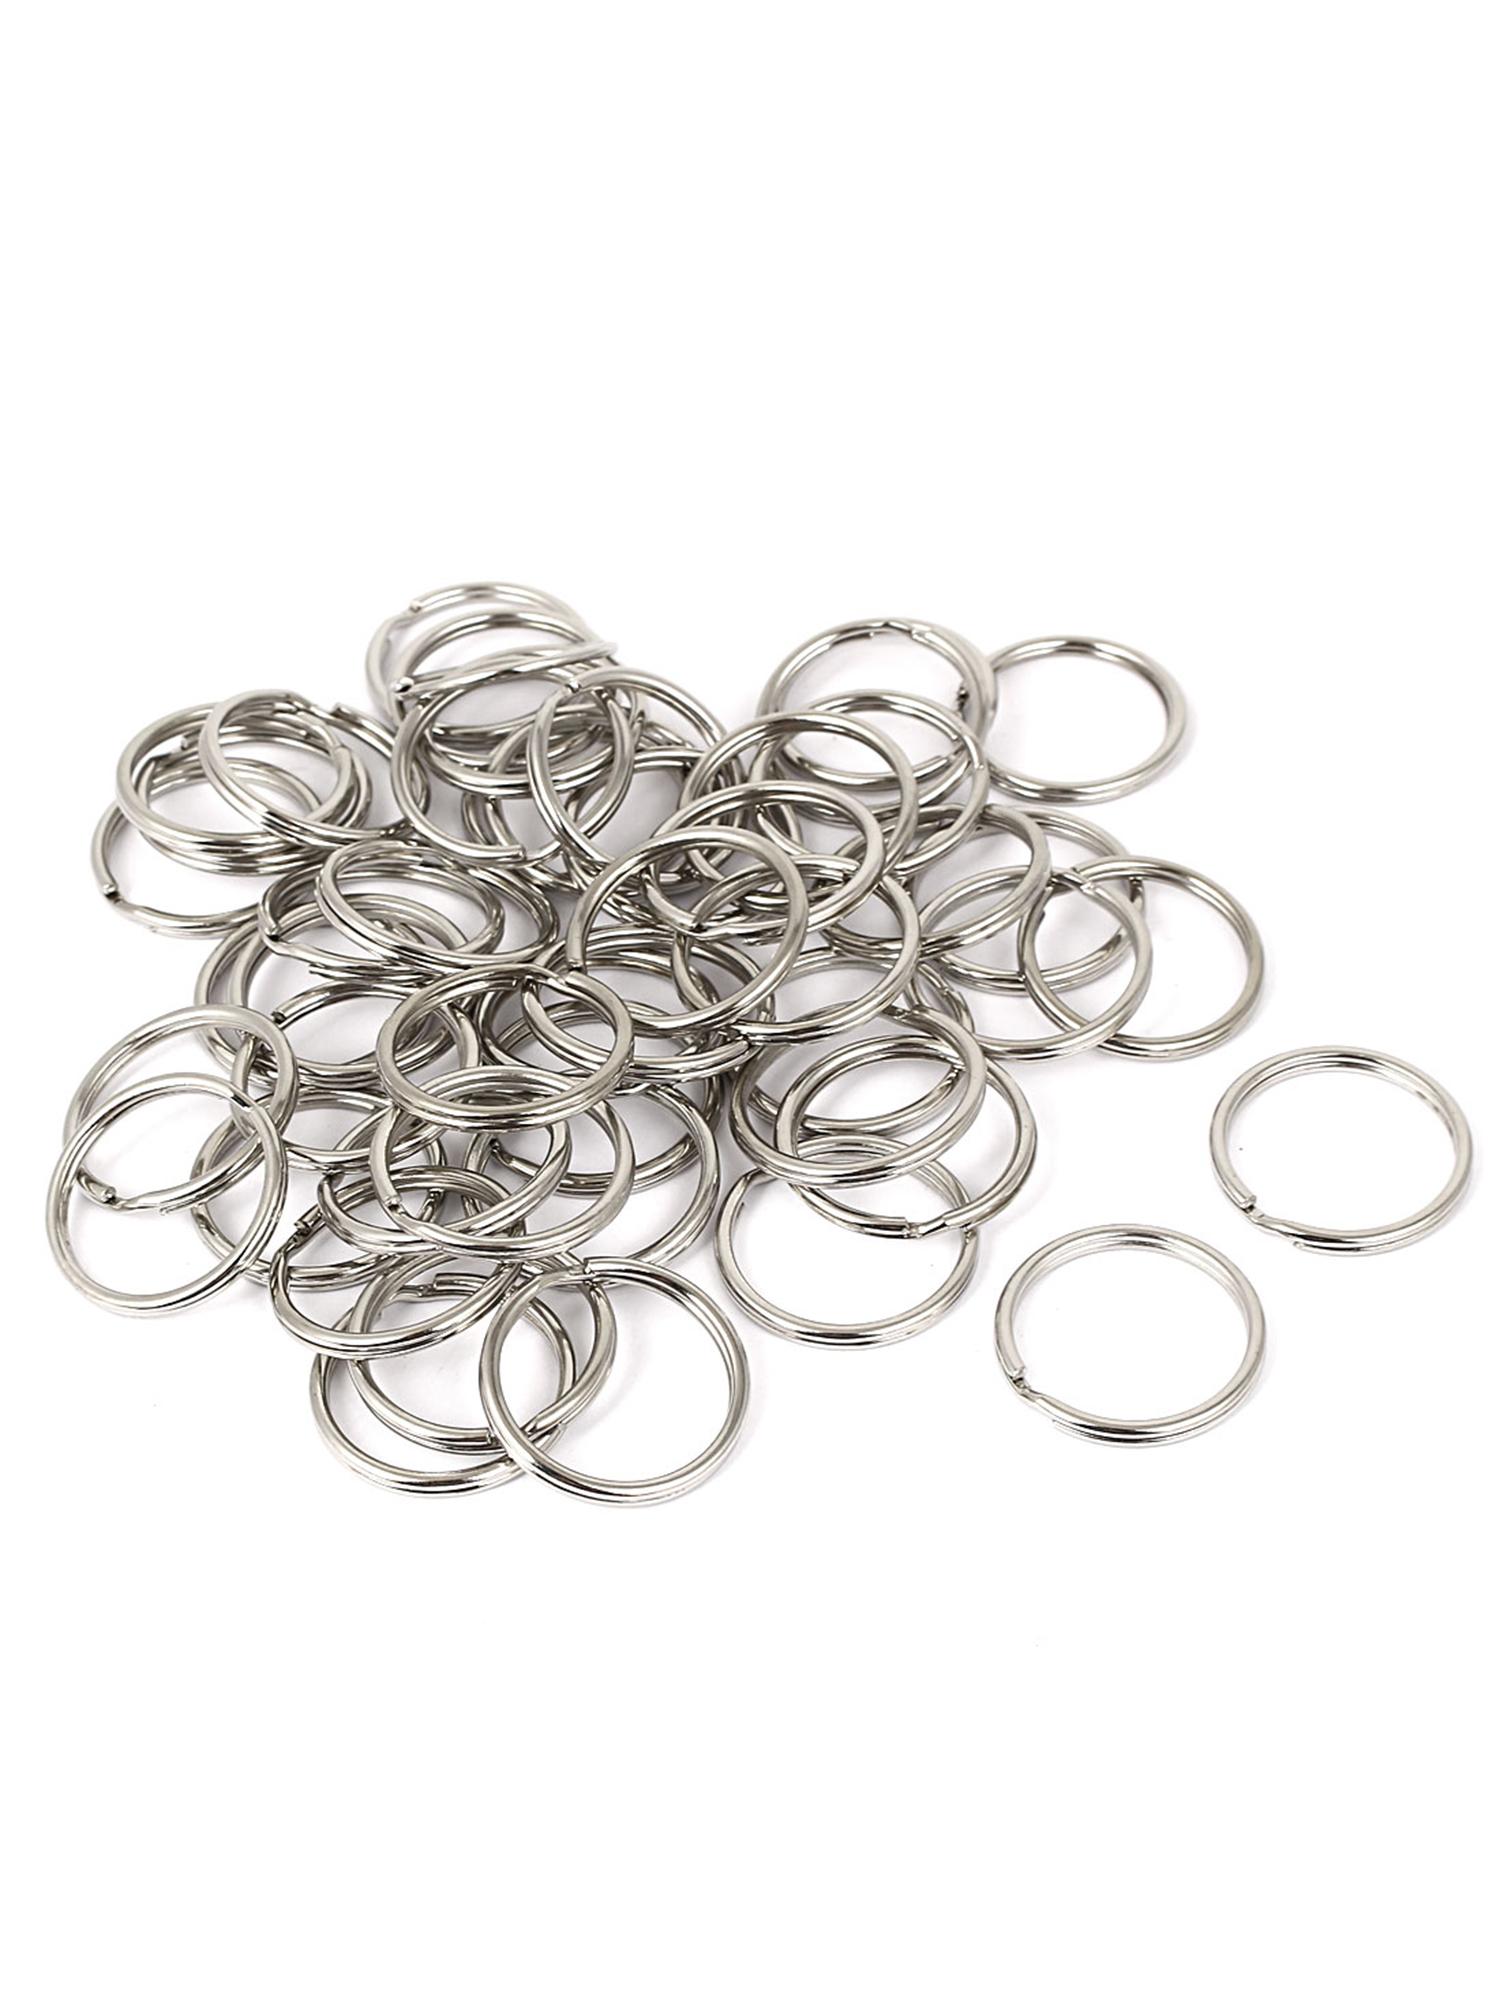 50pcs 28mm Dia Silver Tone Metal Split Ring Key Keychain Keyring